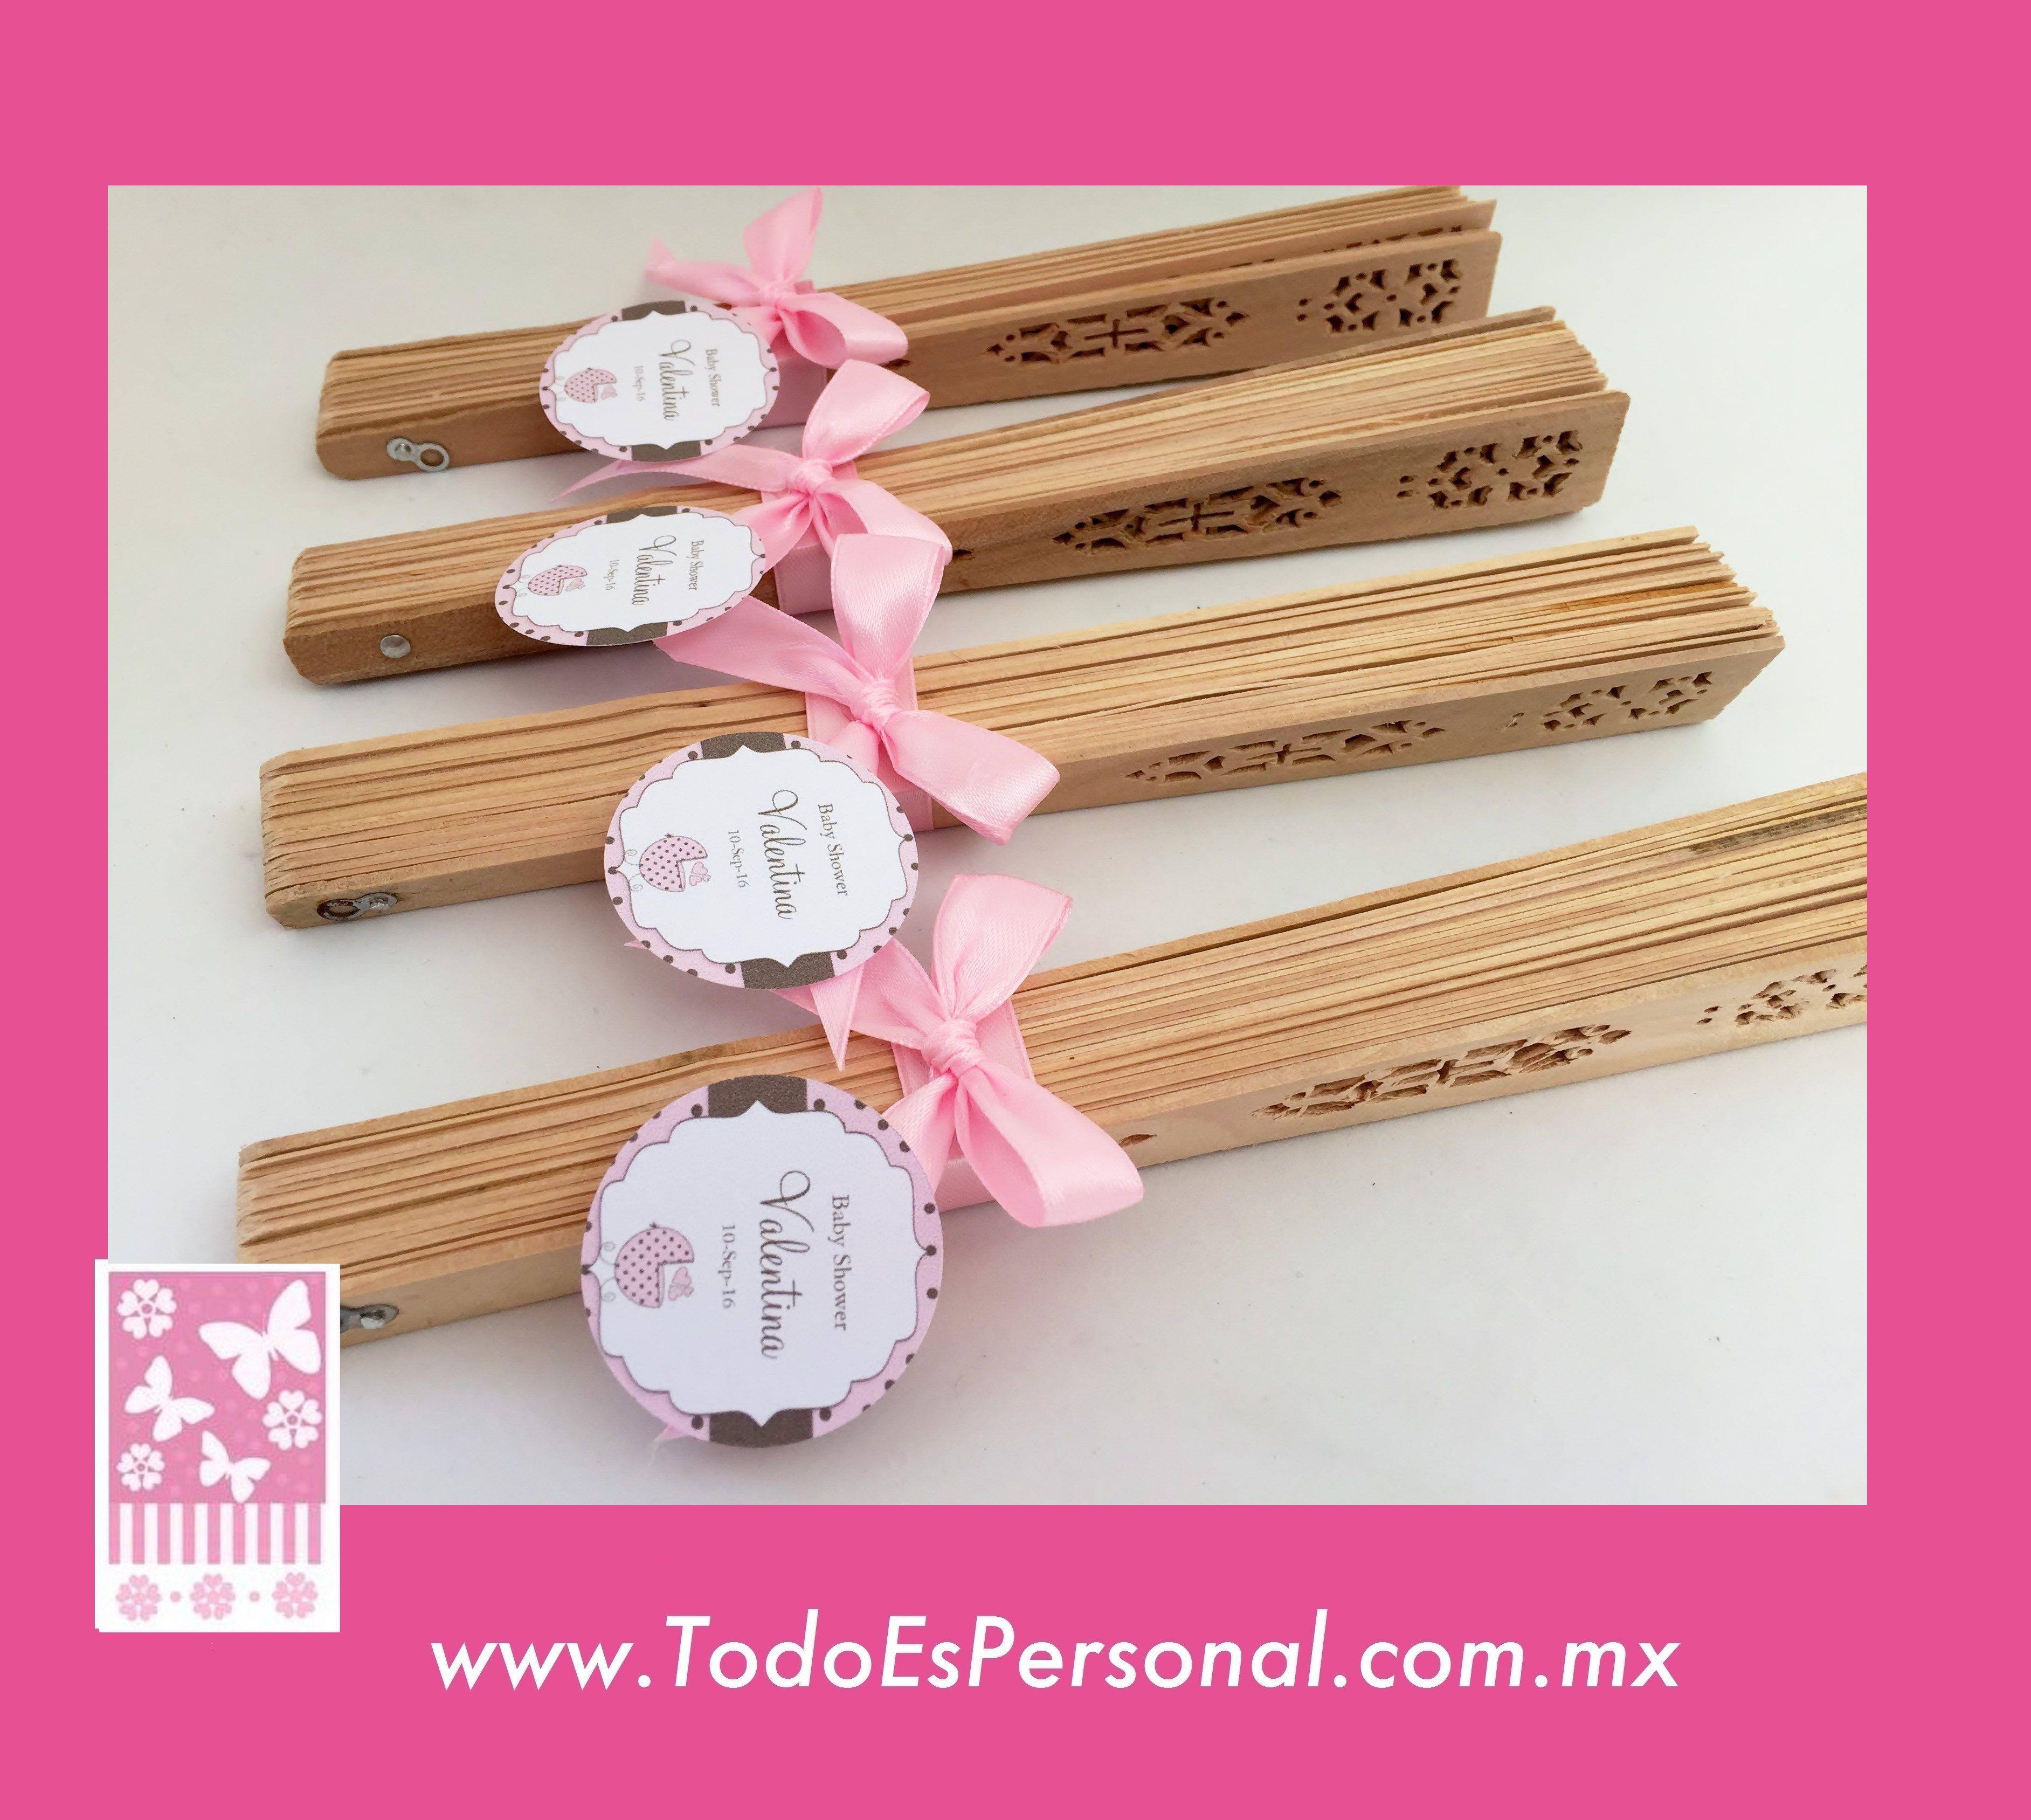 Abanicos para baby shower recuerdos detalles ni±a $16 00 c u